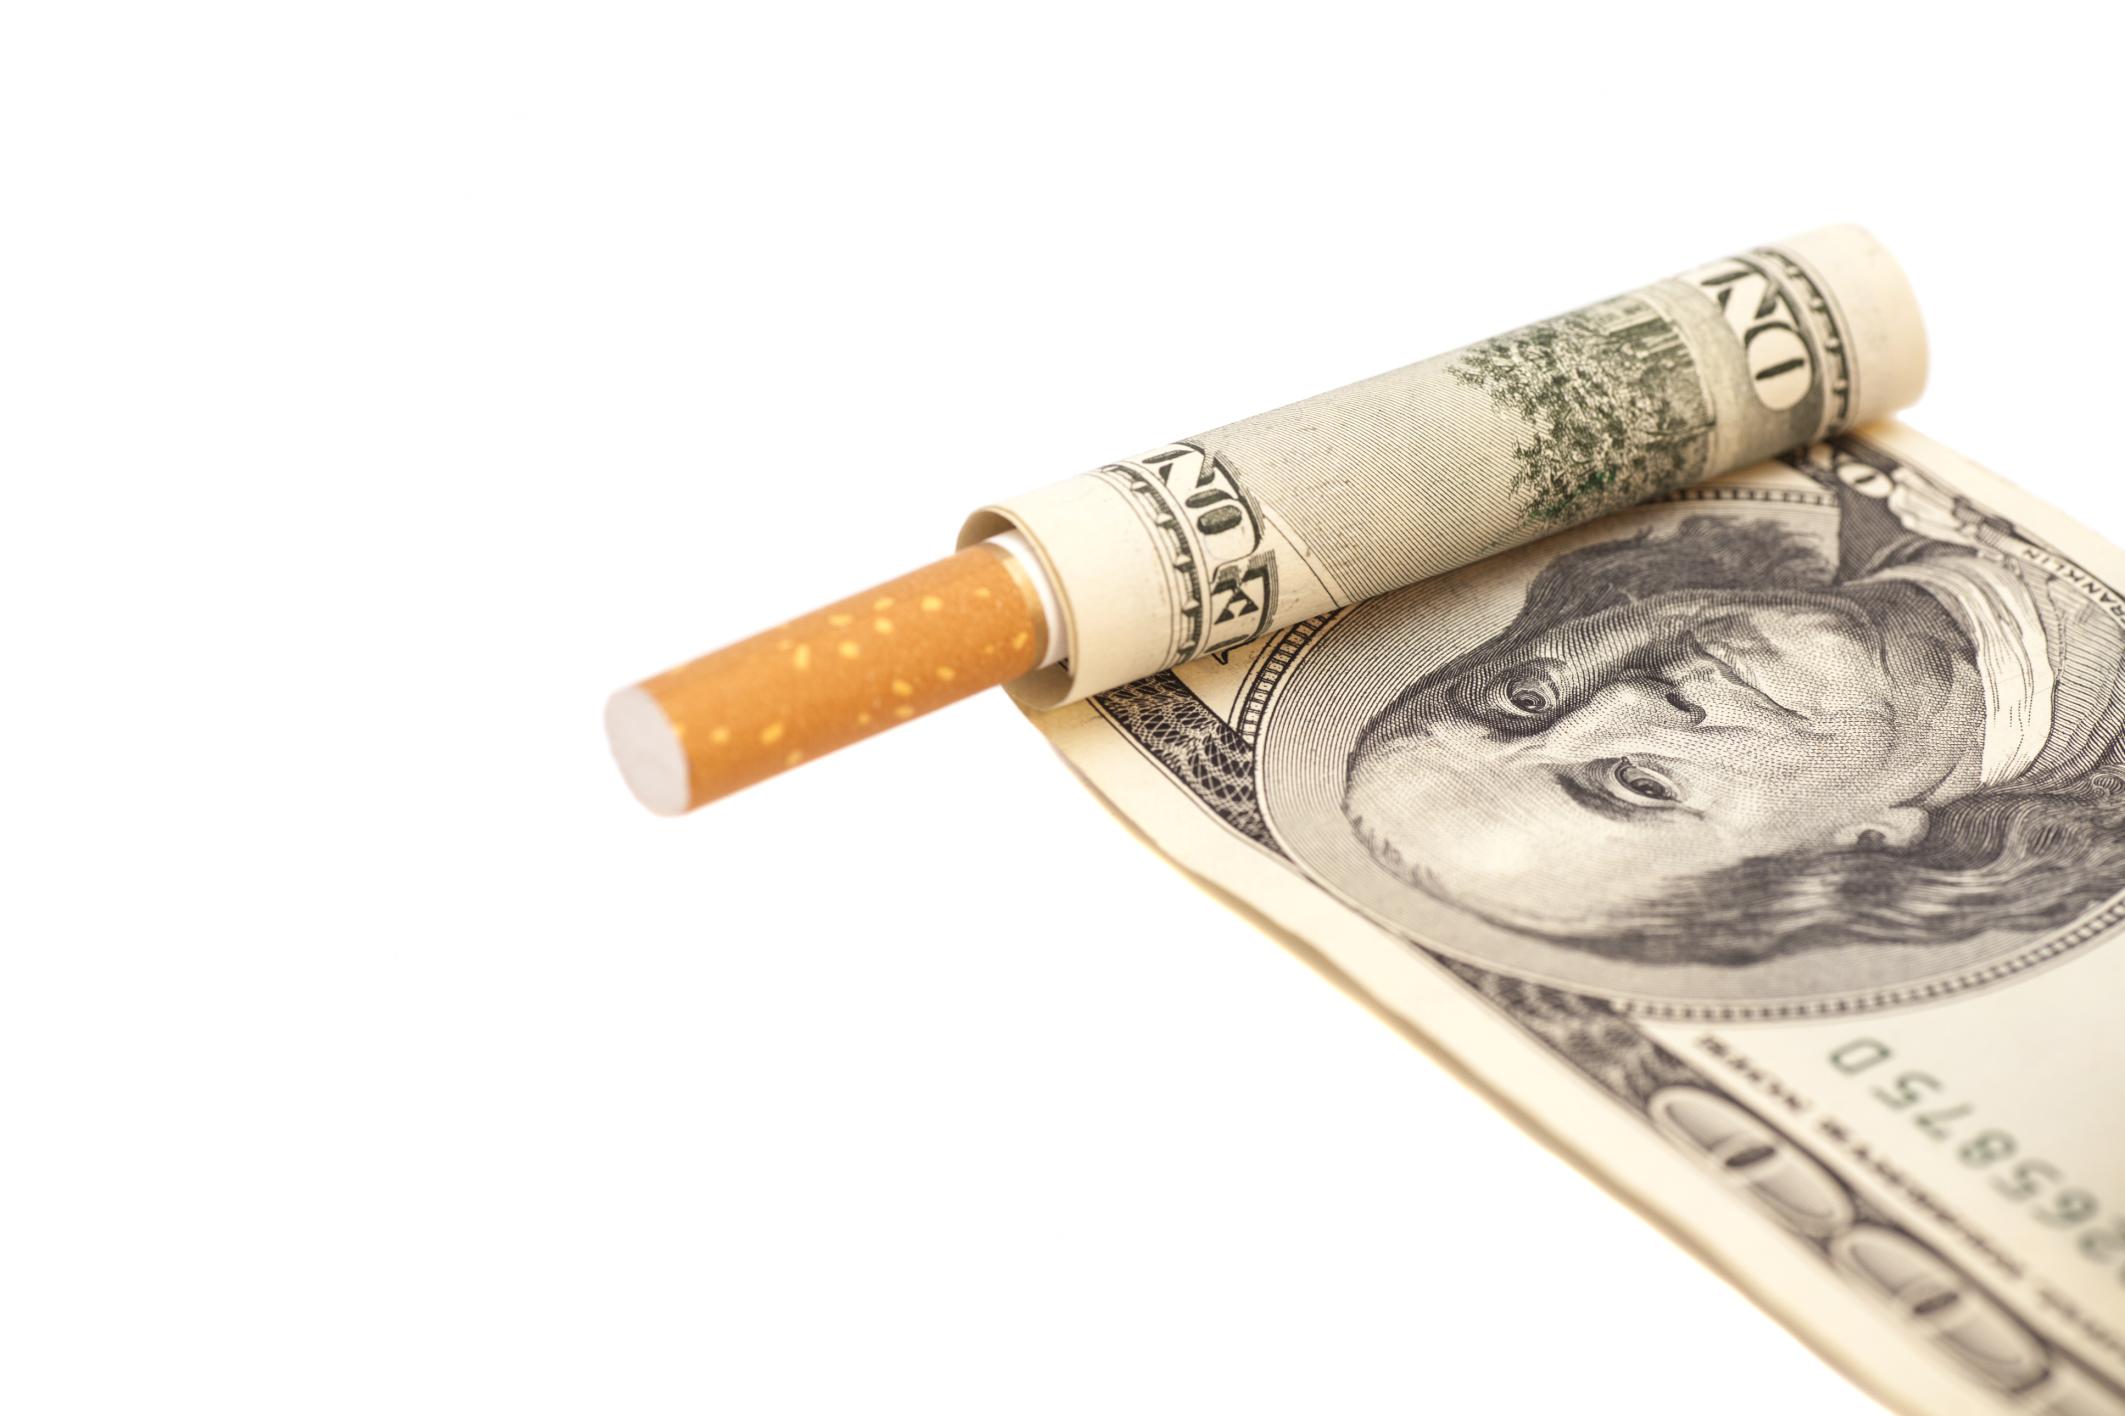 Cost Of Smoking Calculator